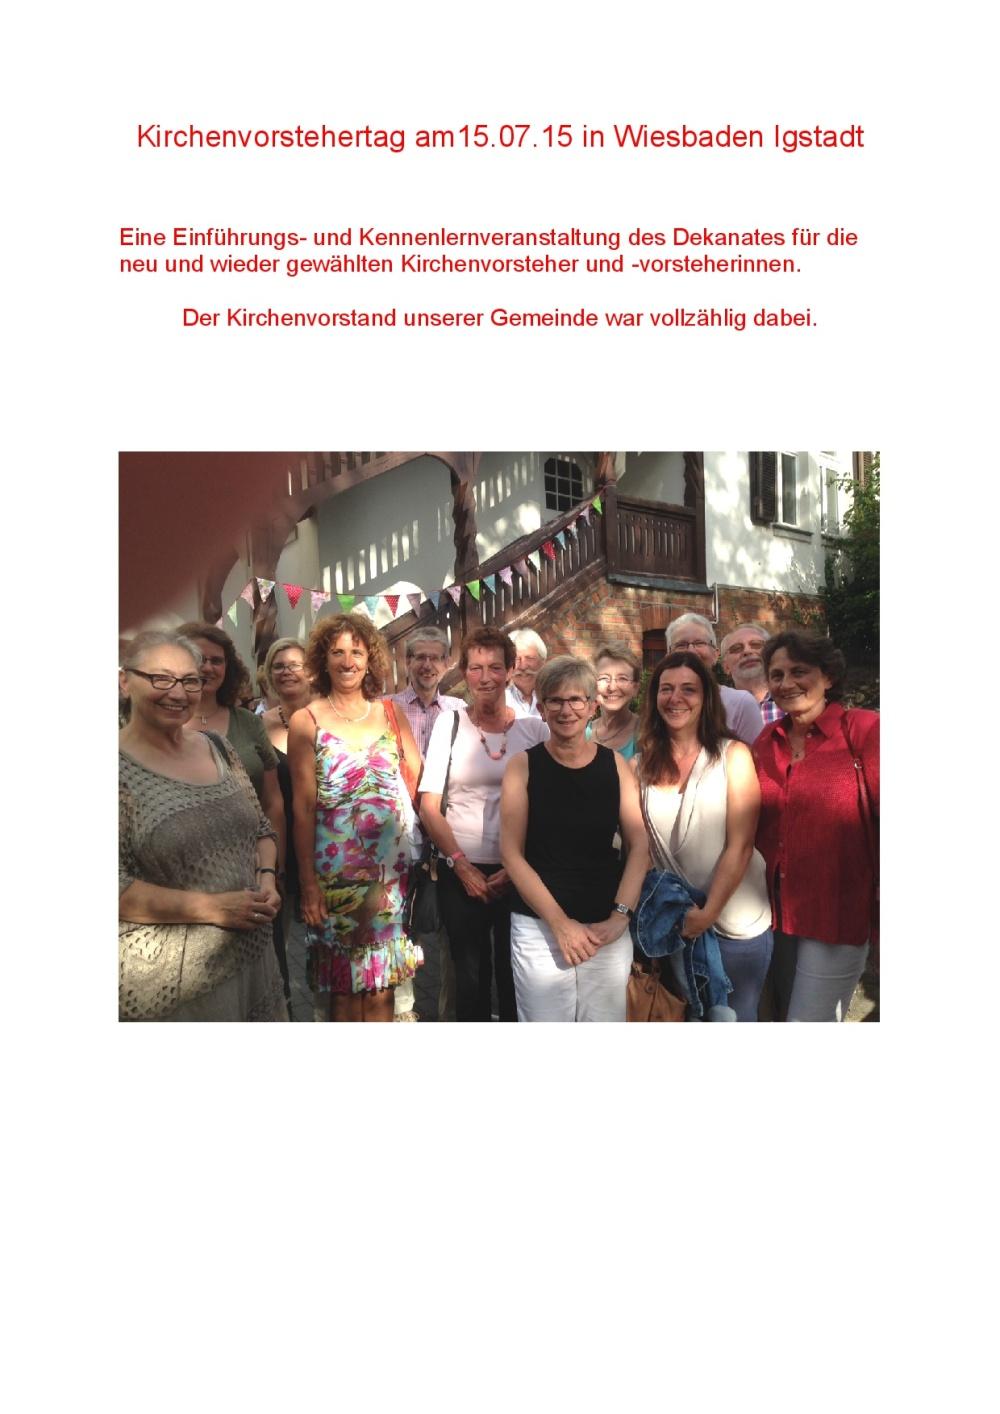 2015-07-15 Kirchenvorstehertag-001